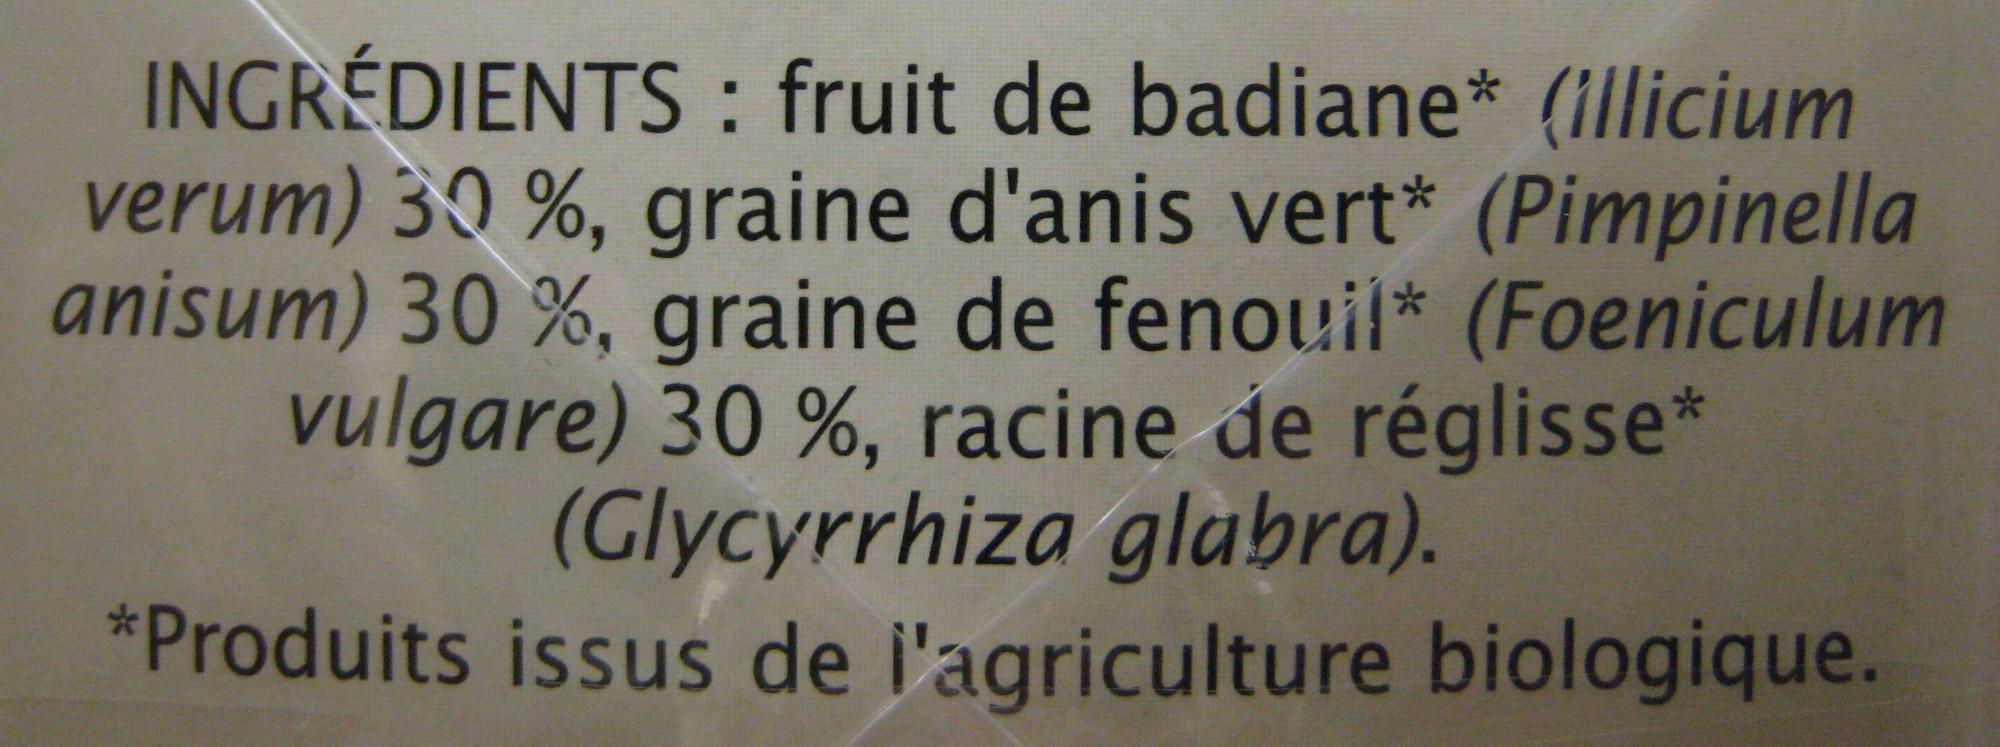 Infusion Digestion légère Jardin Bio - Ingrediënten